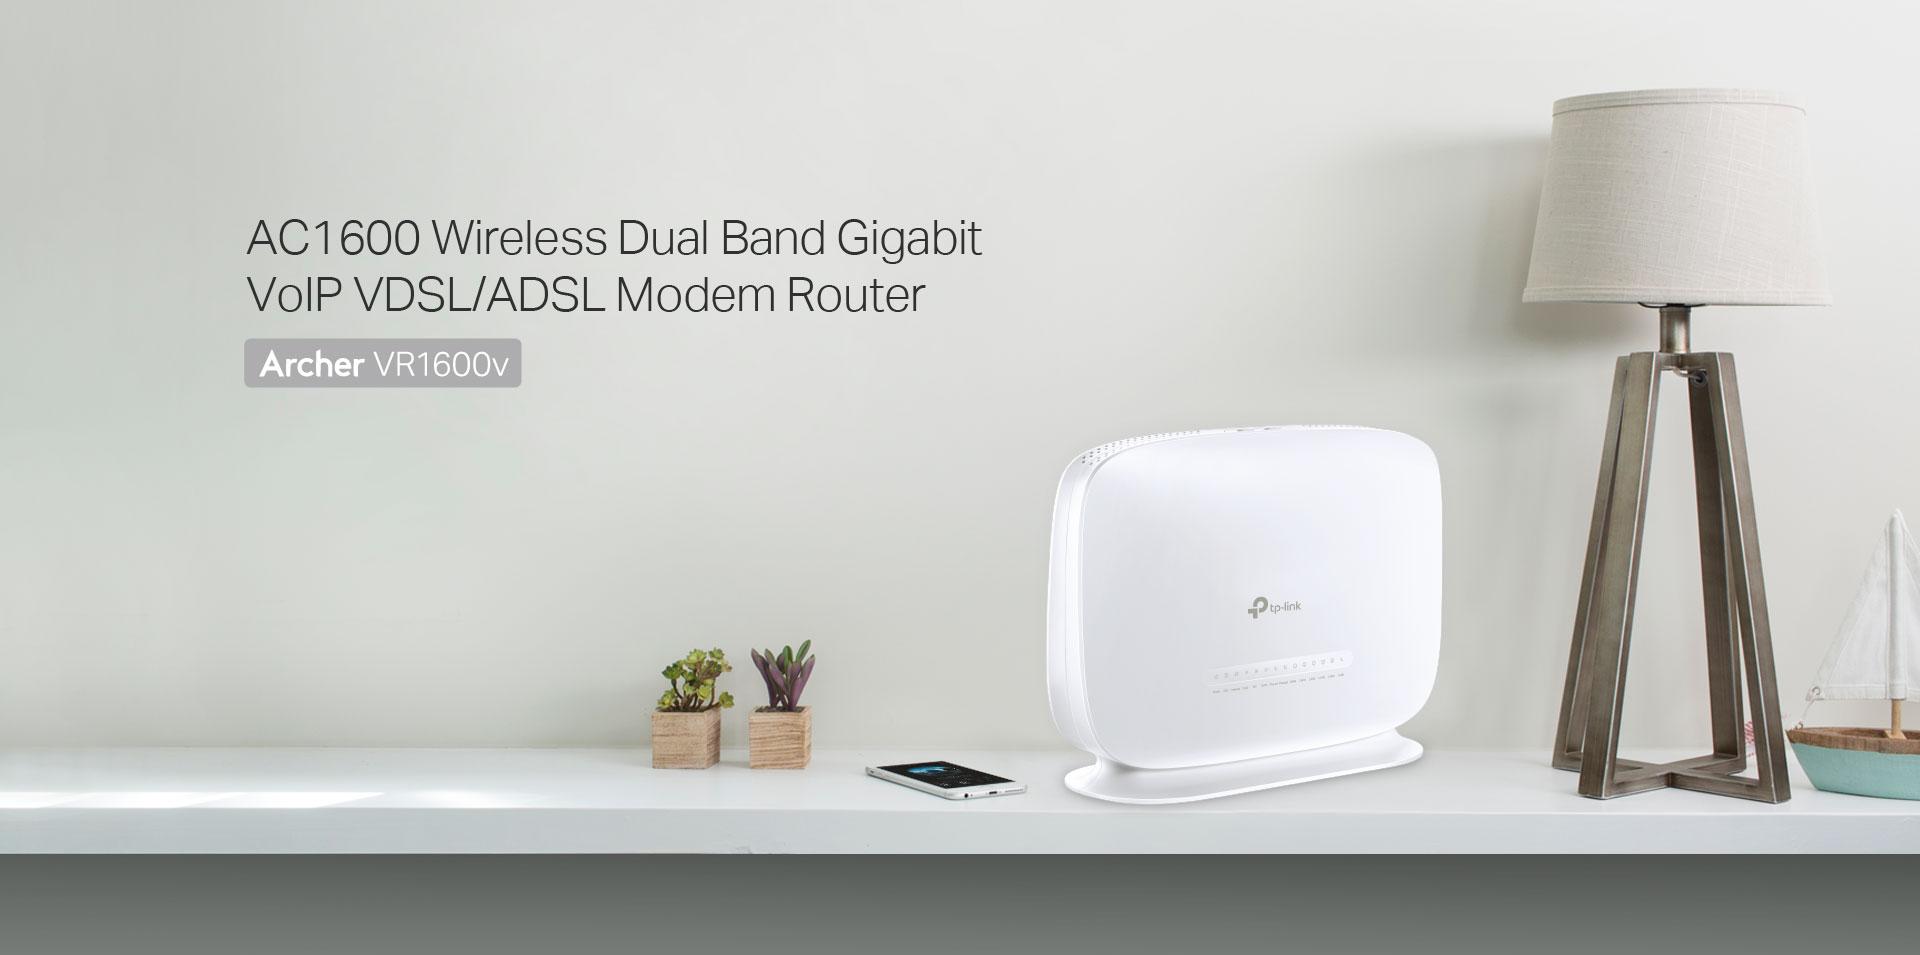 Archer VR1600v | AC1600 Wireless Dual Band Gigabit VoIP VDSL/ADSL